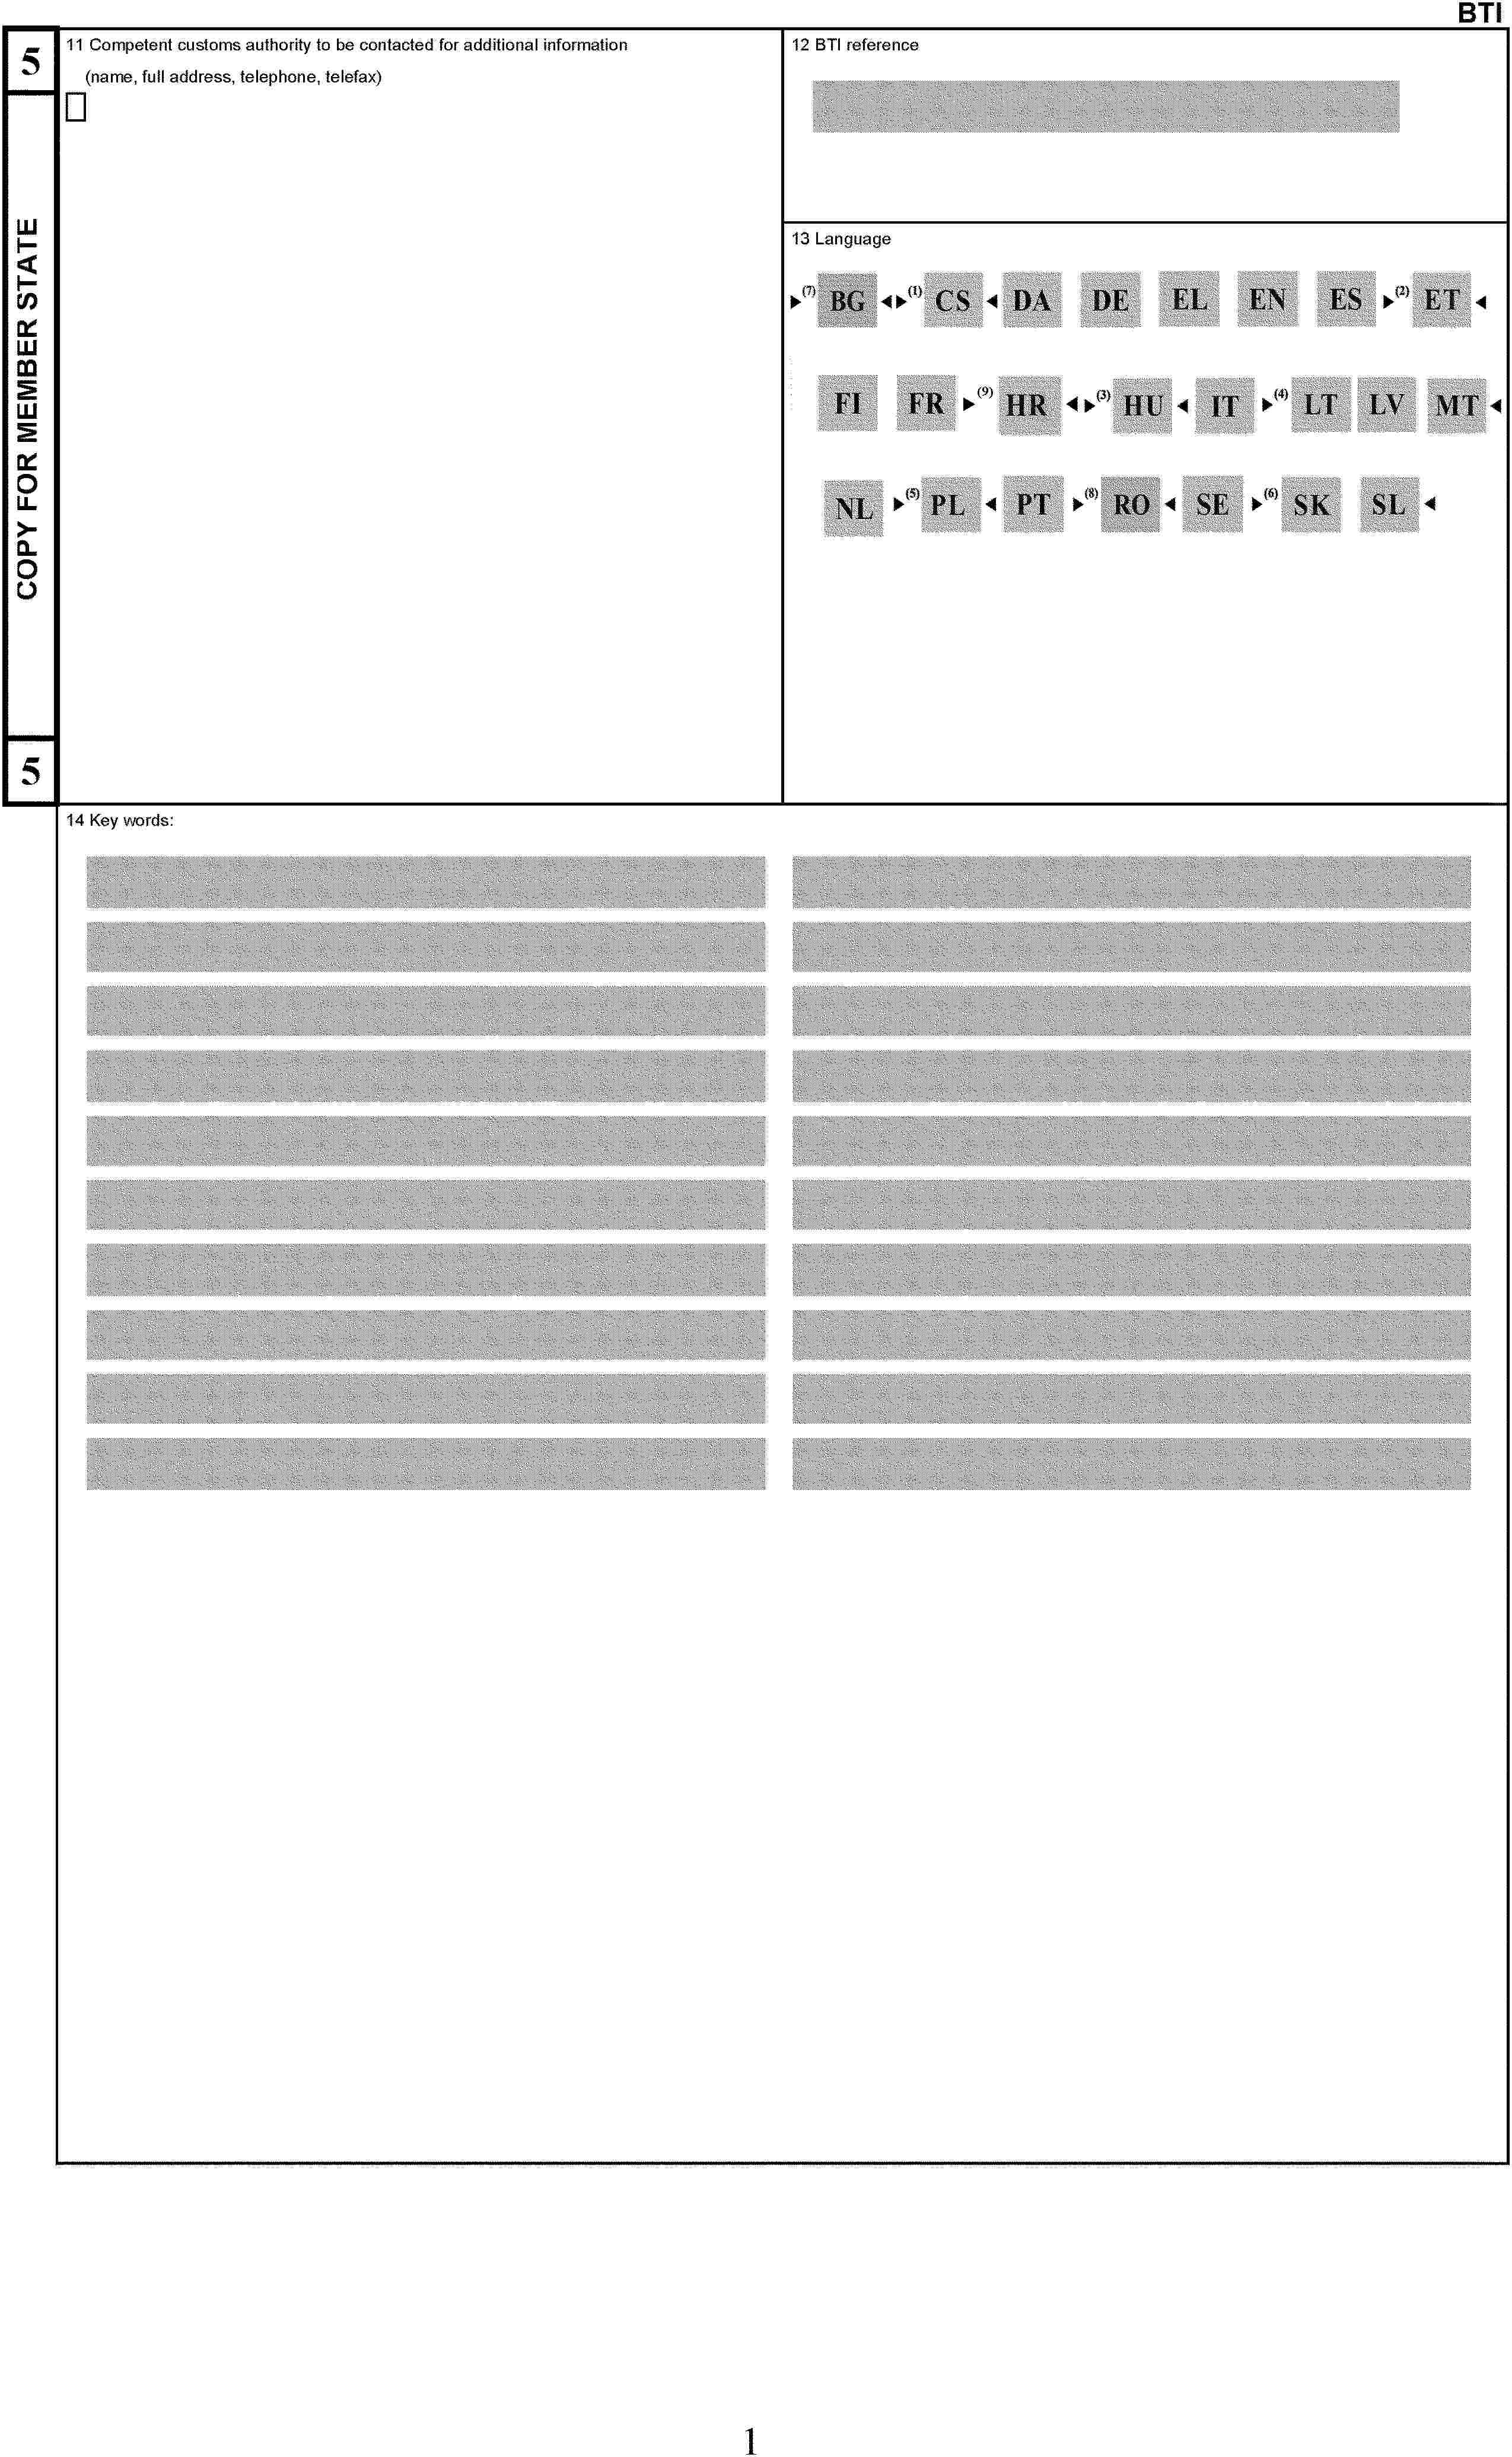 EUR-Lex - 01993R2454-20150501 - EN - EUR-Lex